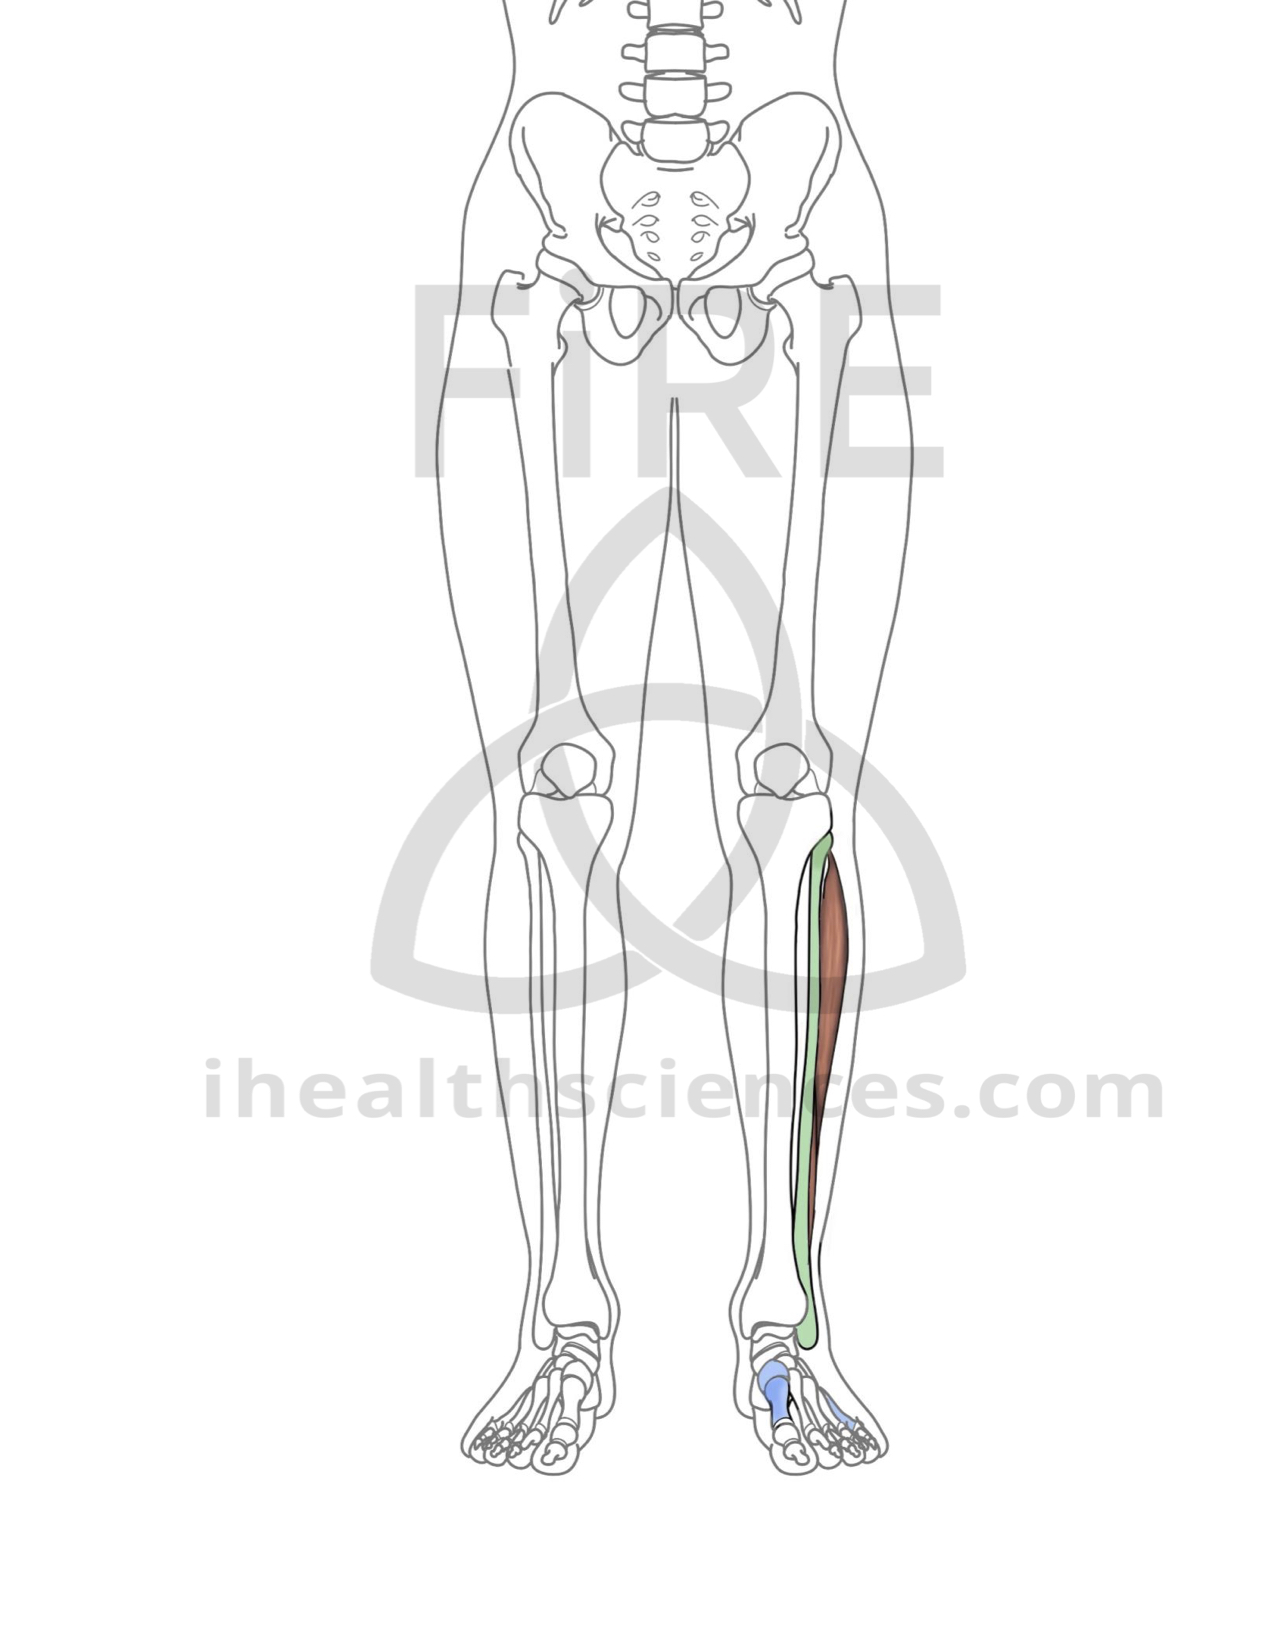 peroneus longus and brevis (anterior).jpg